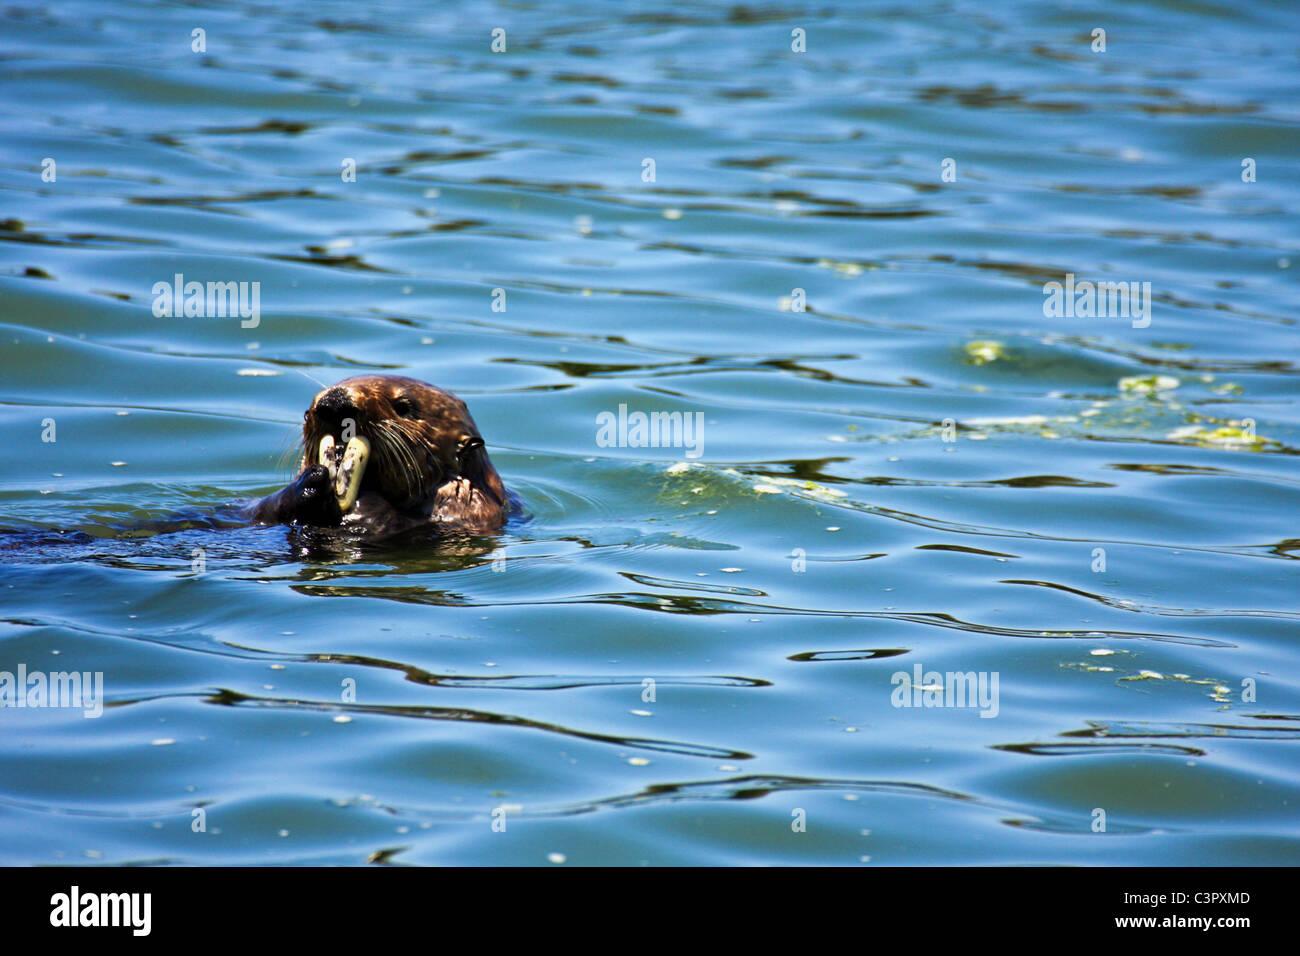 California sea otter, Enhydra lutris, Pacific Coast, Elkhorn Slough National Estuarine Research Reserve - Stock Image